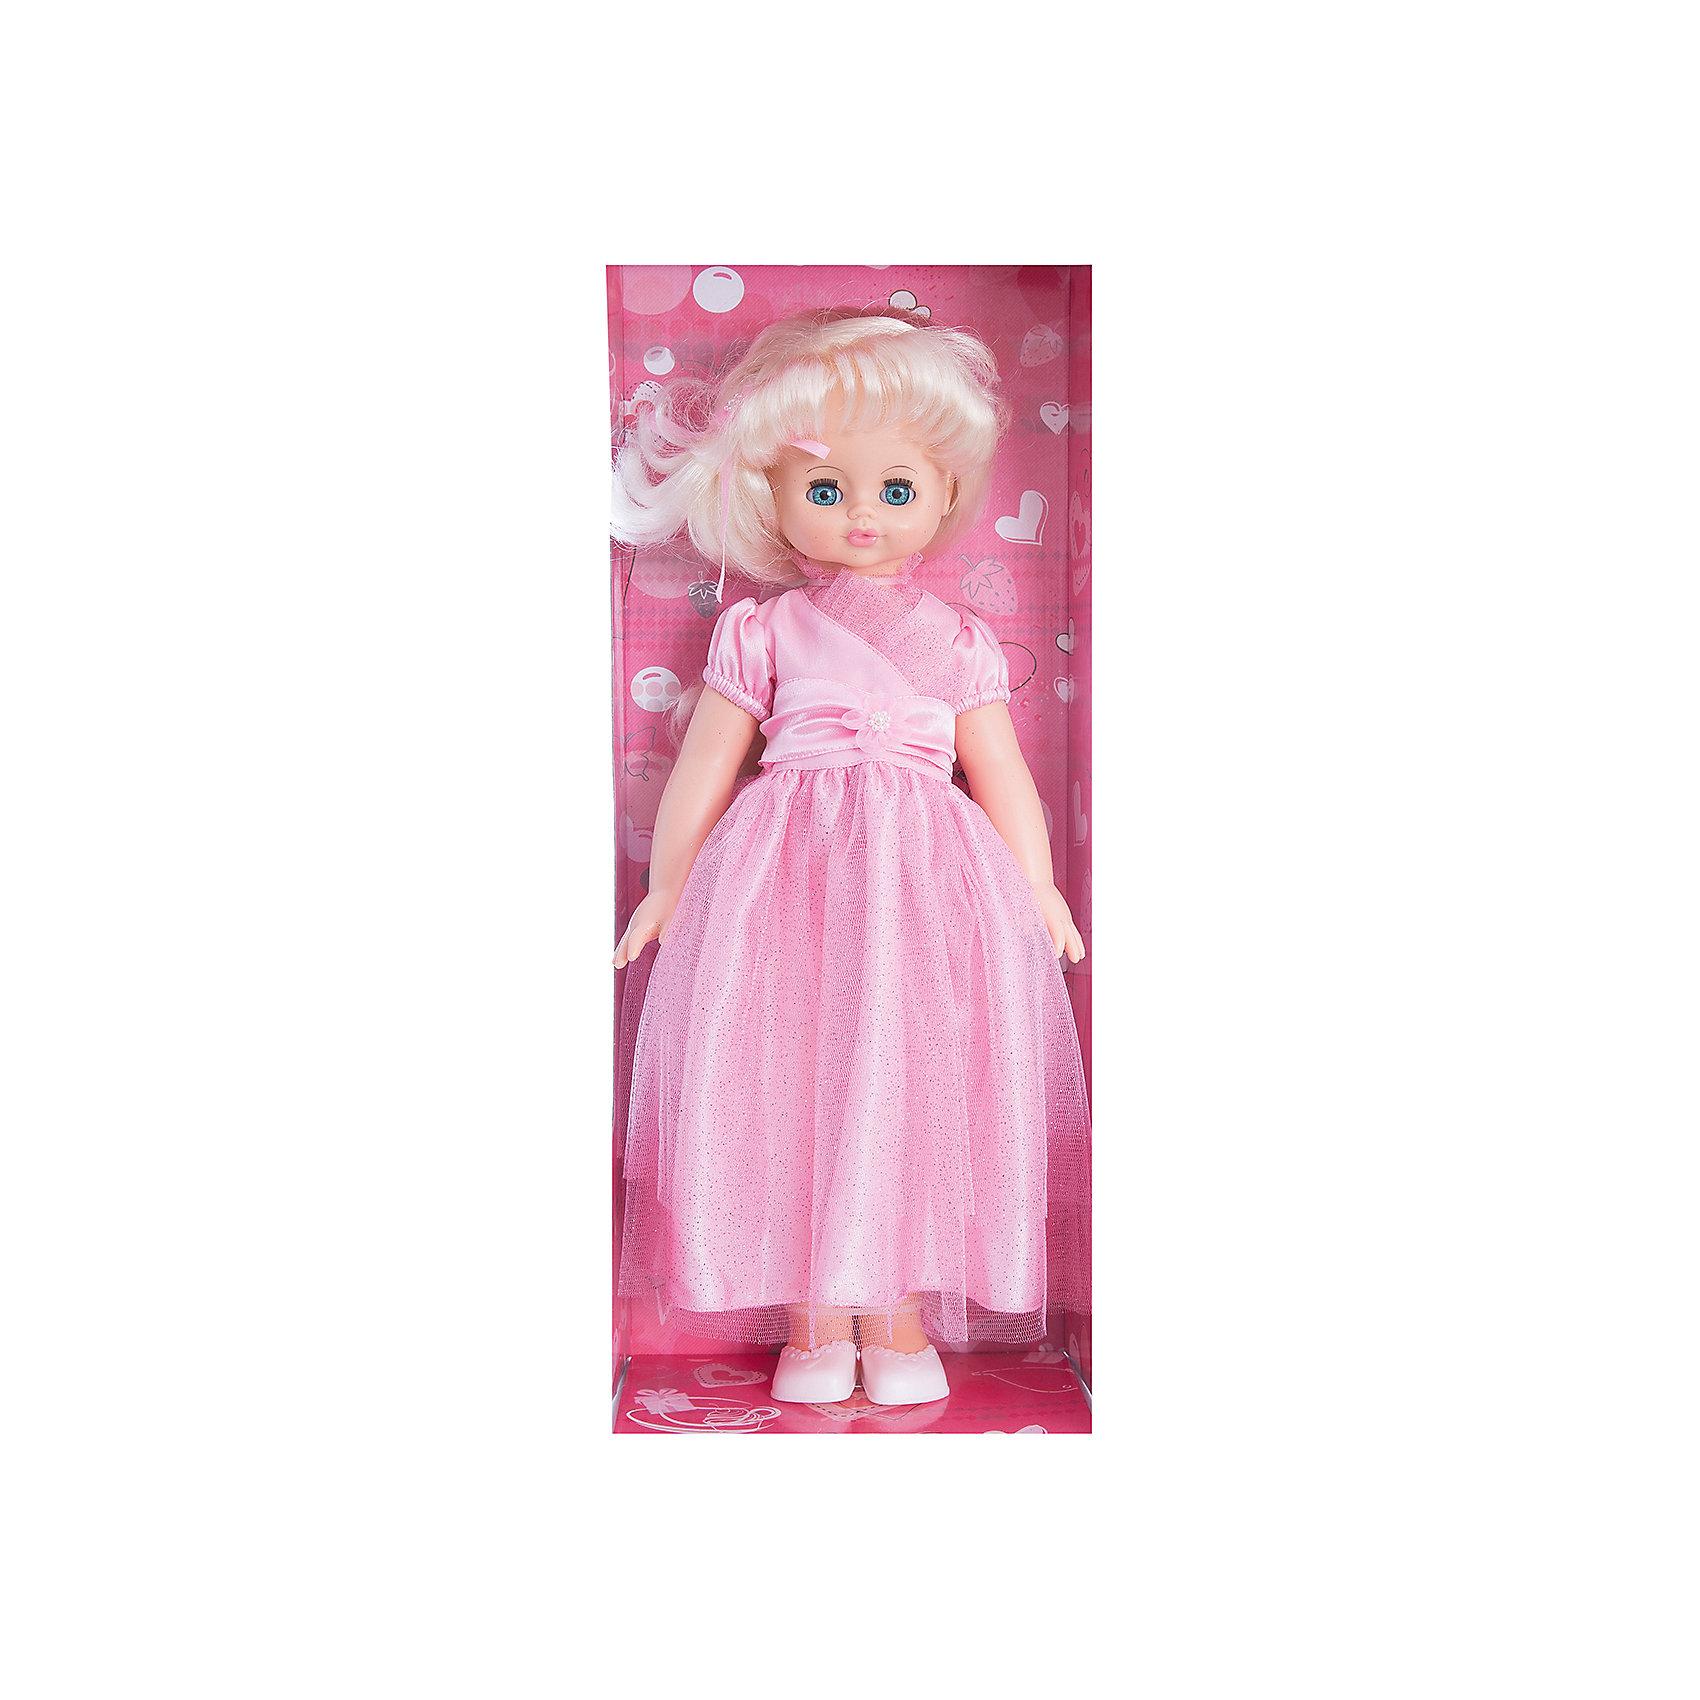 Весна Кукла Алиса 17, со звуком, Весна куклы и одежда для кукол llorens кукла алиса 33 см со звуком